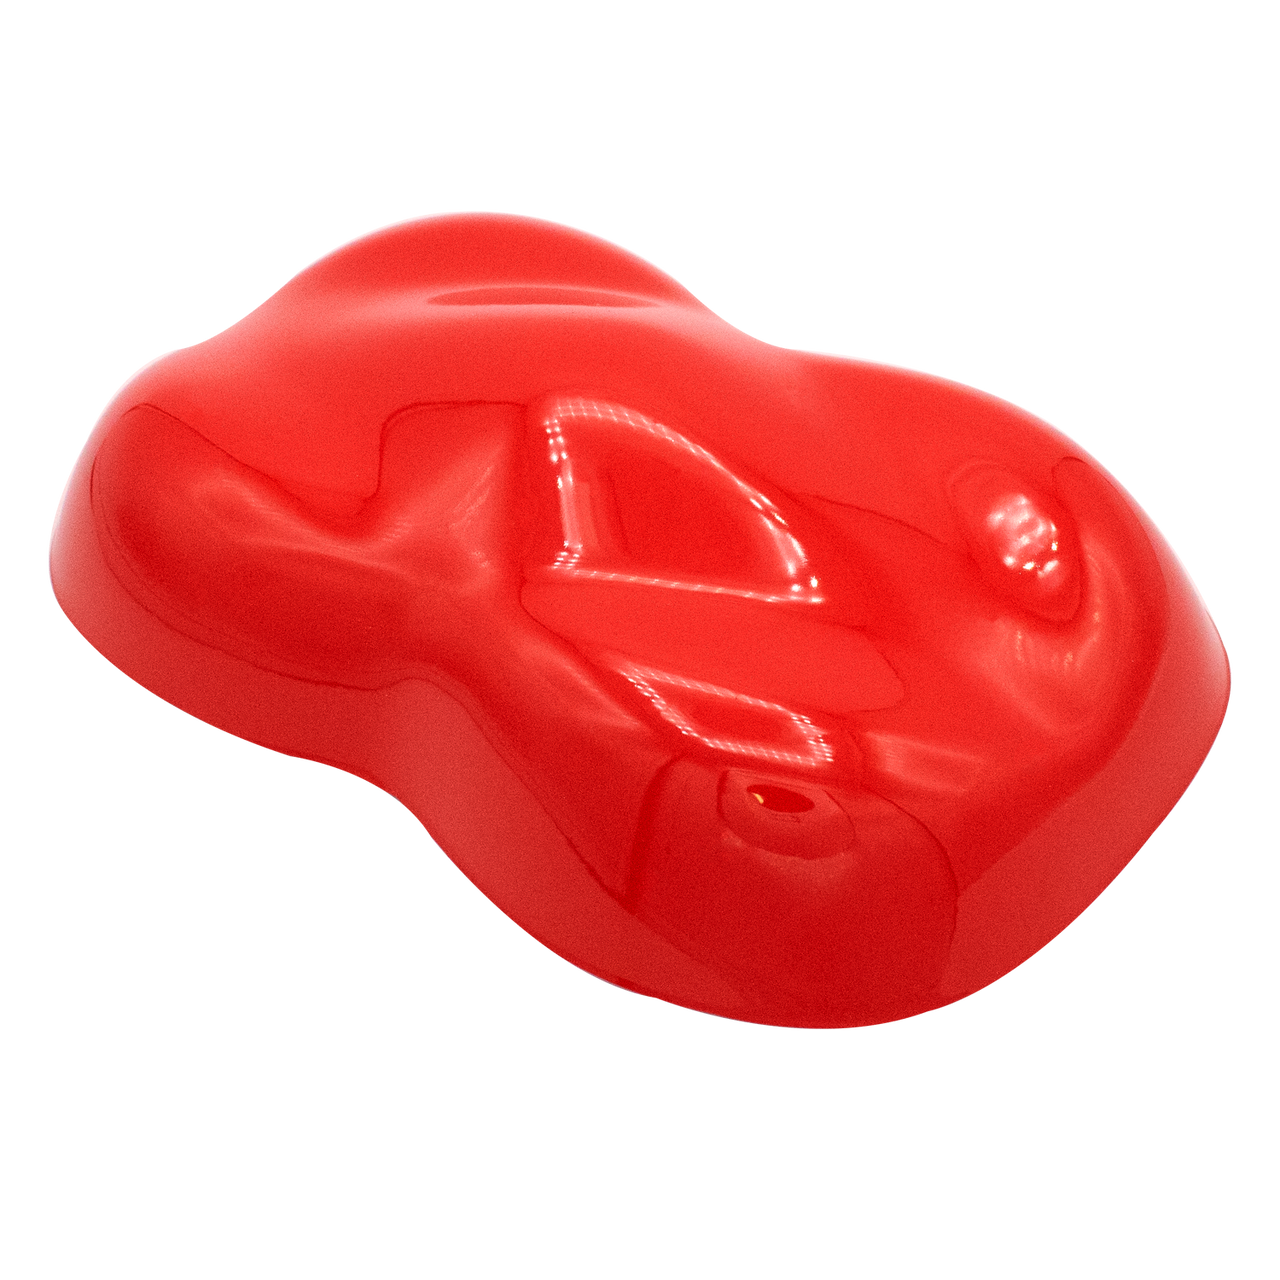 High Gloss Race Red 2K Acrylic Urethane, 4:1 Gallon Hot Temp Kit, SPK9714/SPK95 2.8 VOC Race Red Single Stage Paint, Use in 90+ F